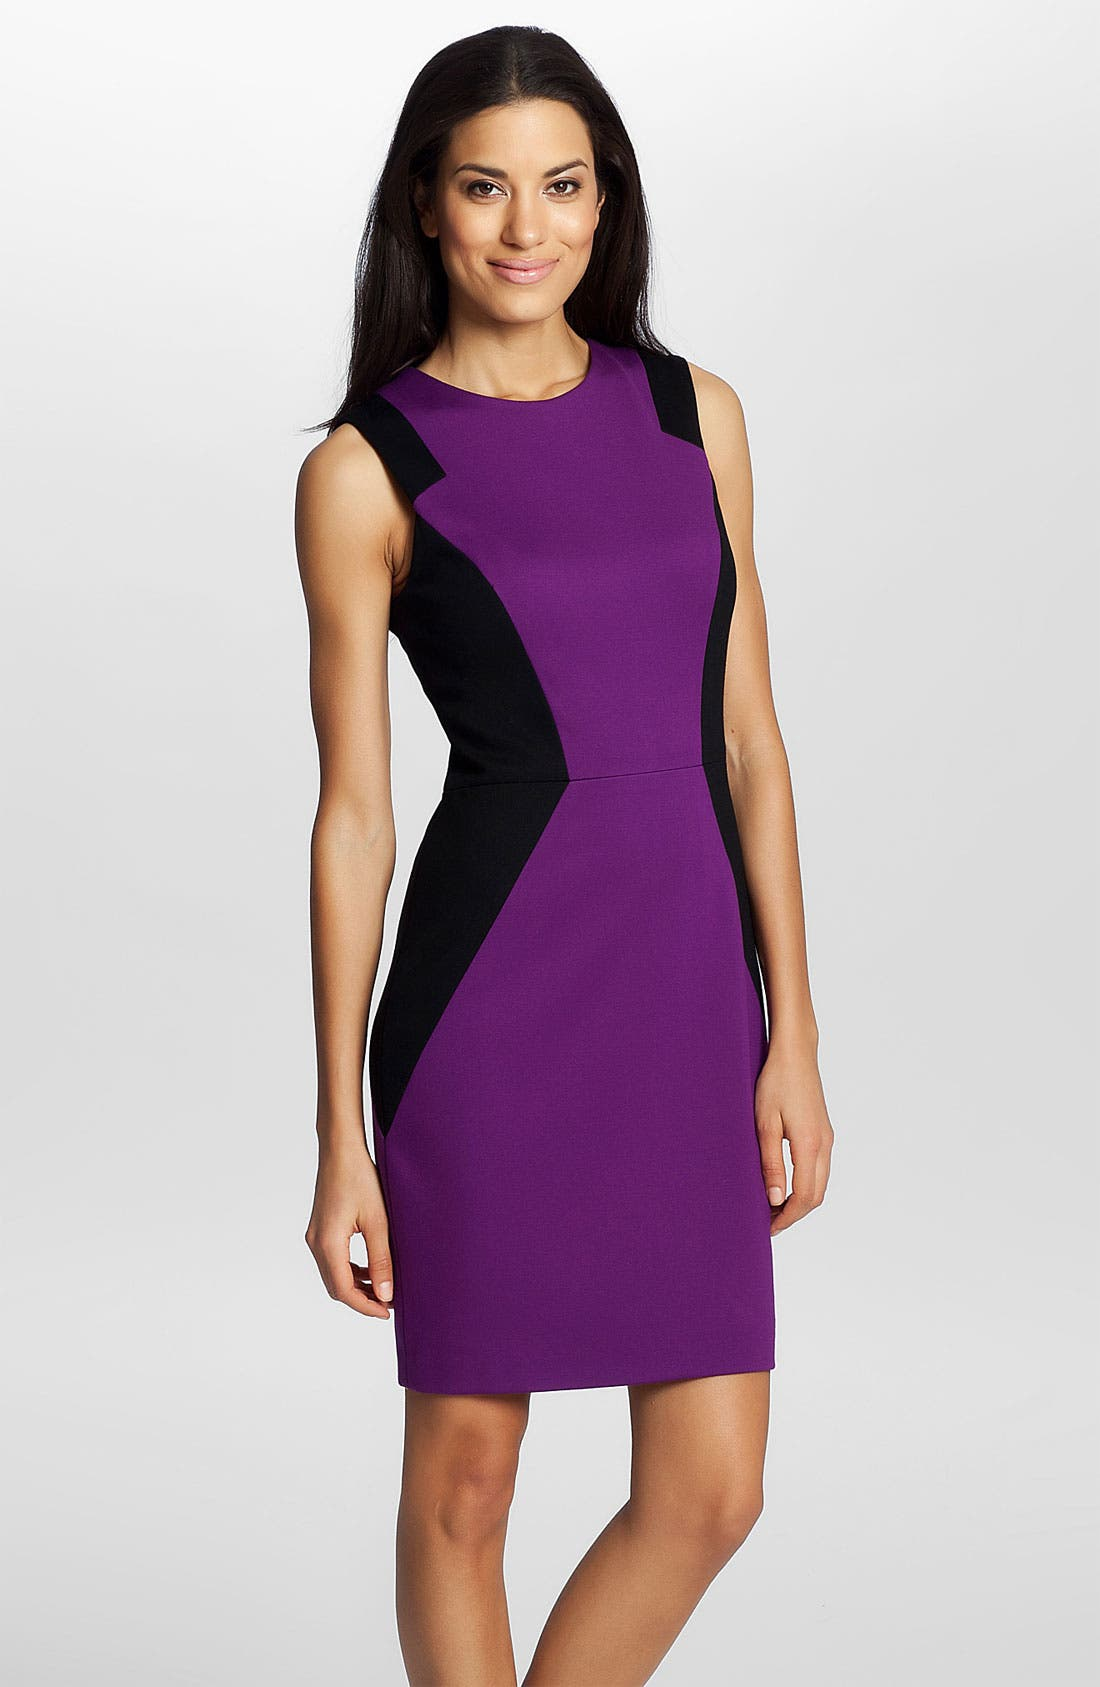 Main Image - Cynthia Steffe 'Aubrey' Colorblock Ponte Dress